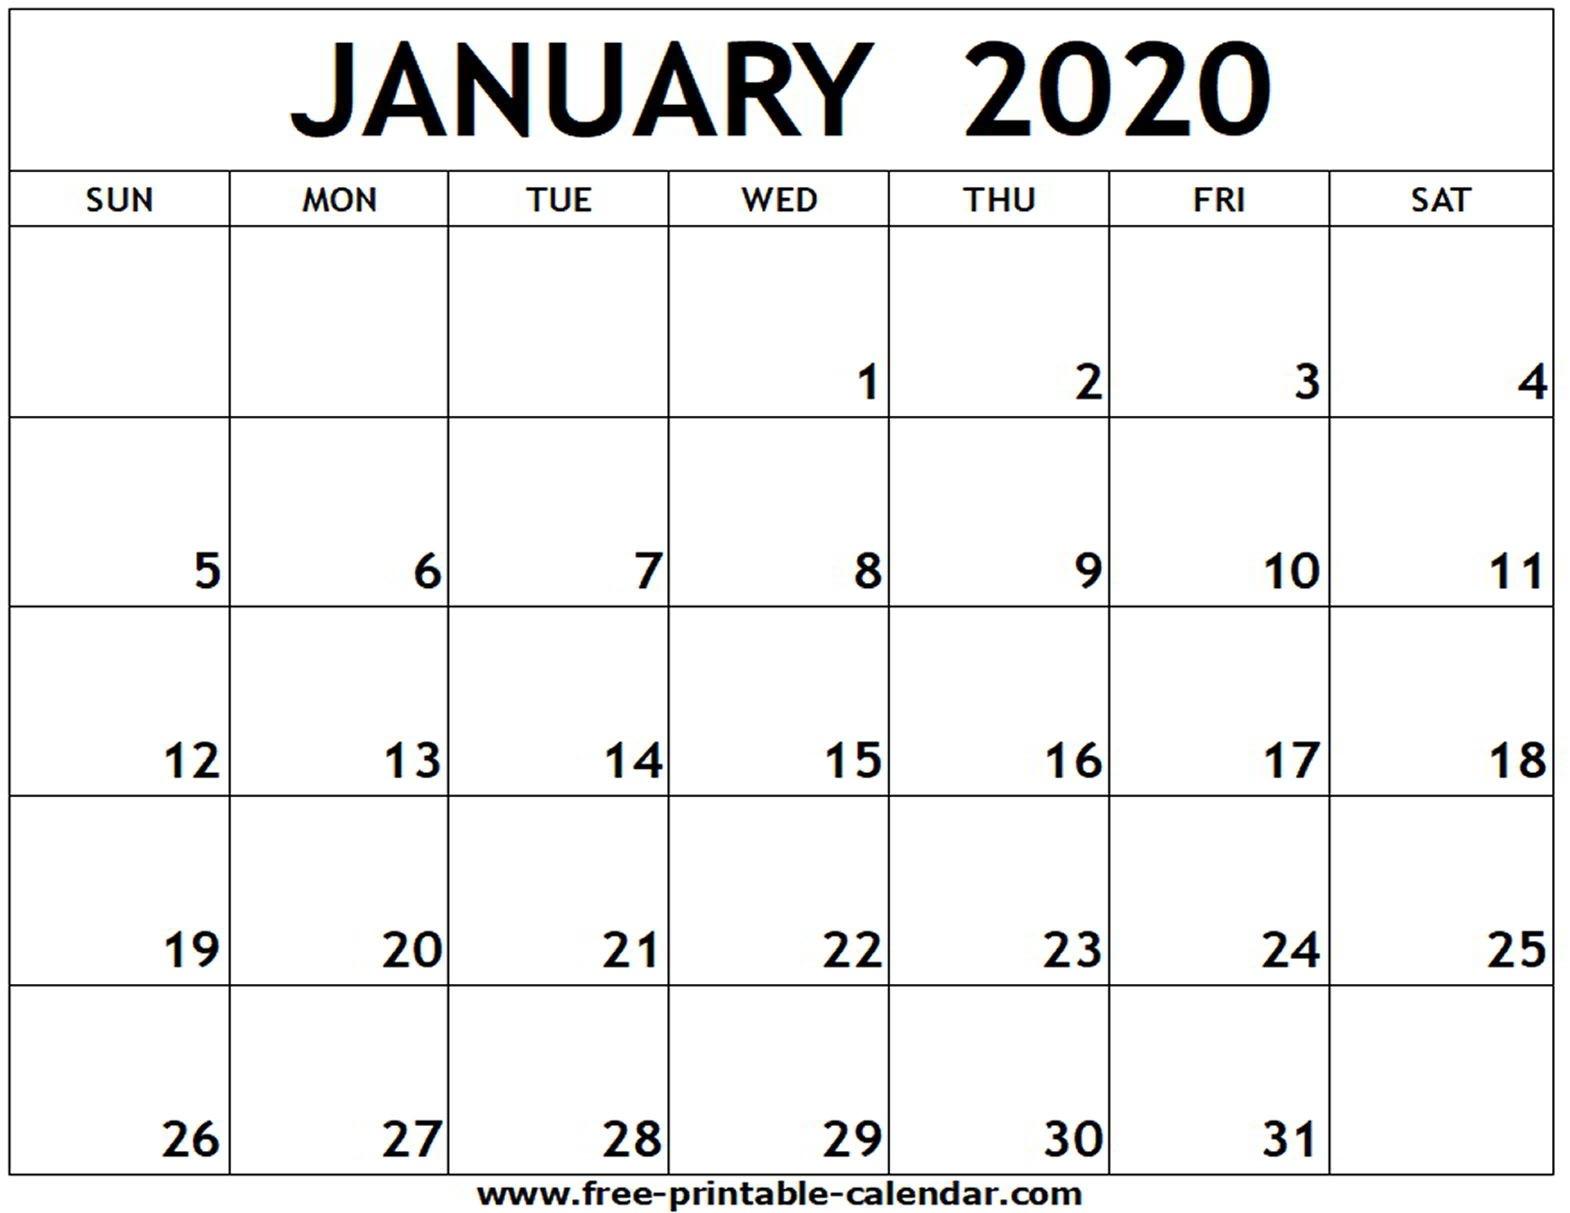 January 2020 Printable Calendar - Free-Printable-Calendar-January 2020 Calendar Usa